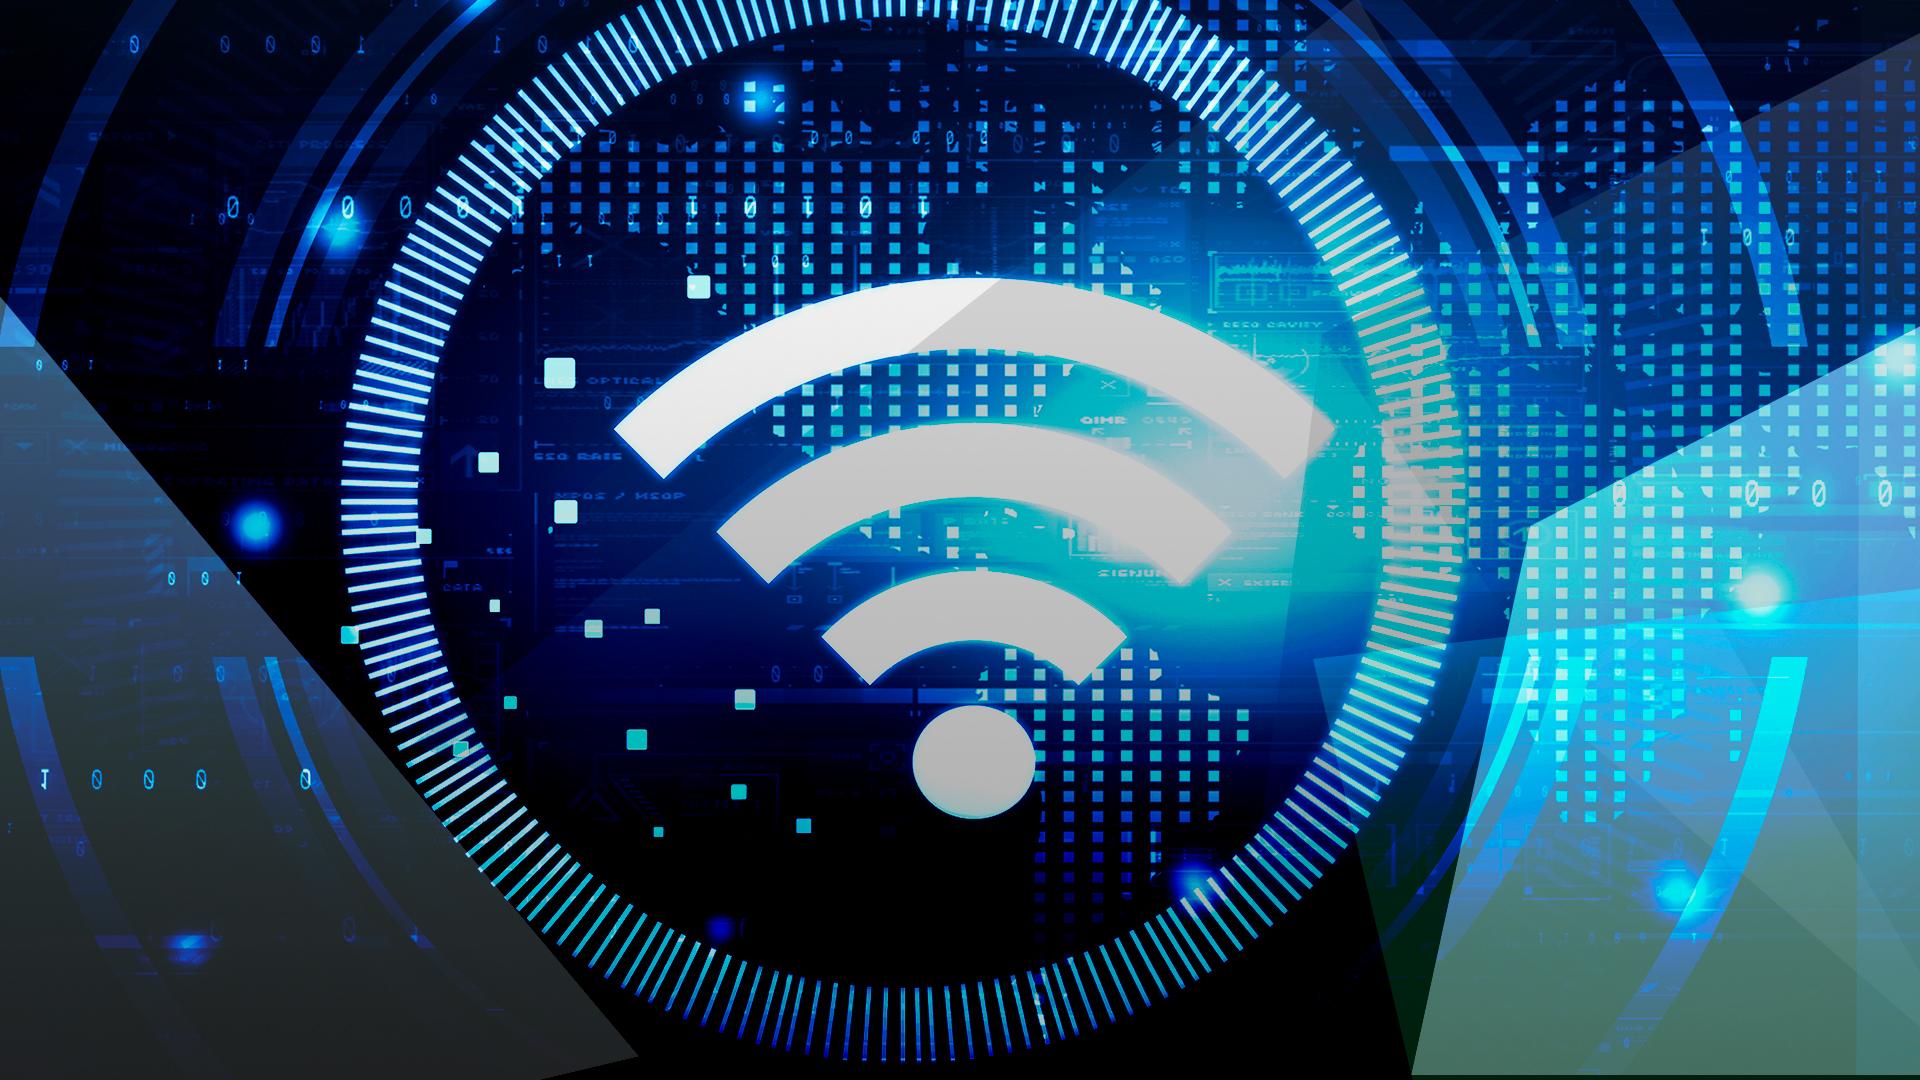 Wlan, WiFi, Wireless, Hotspot, Wlan Hotspot, WifiSpot, Wireless LAN